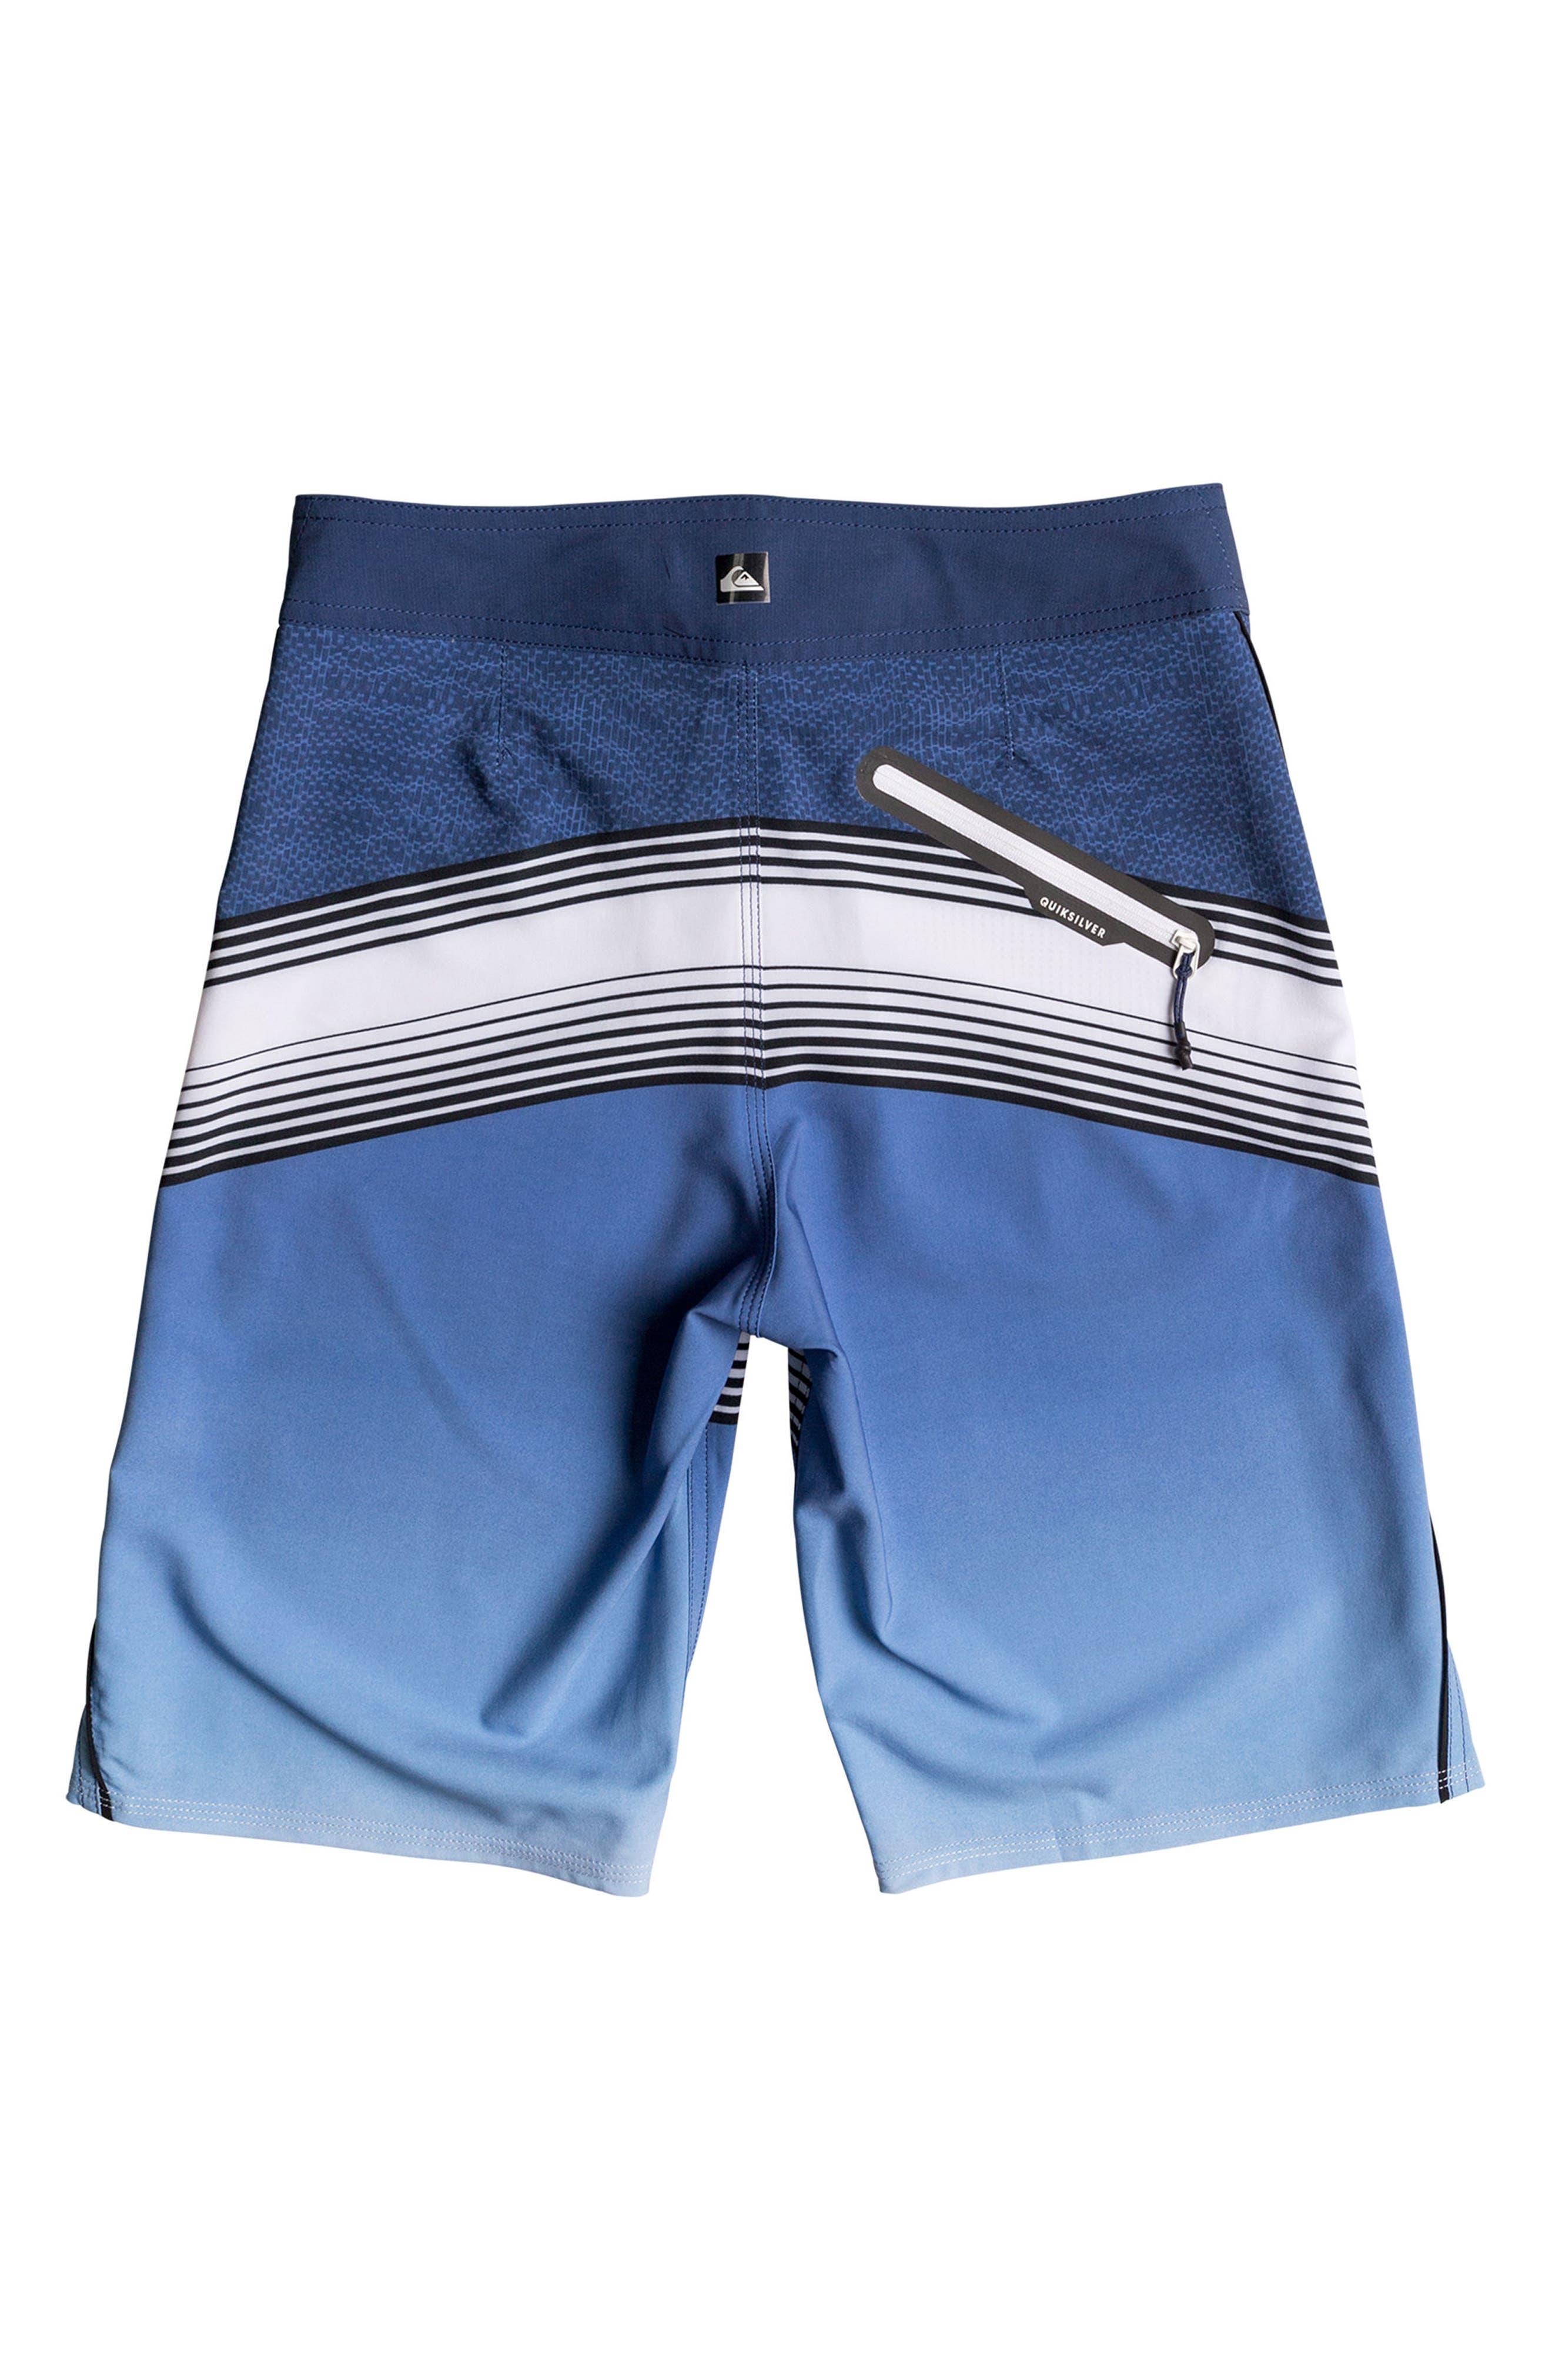 Alternate Image 2  - Quiksilver Division Fade Board Shorts (Big Boys)